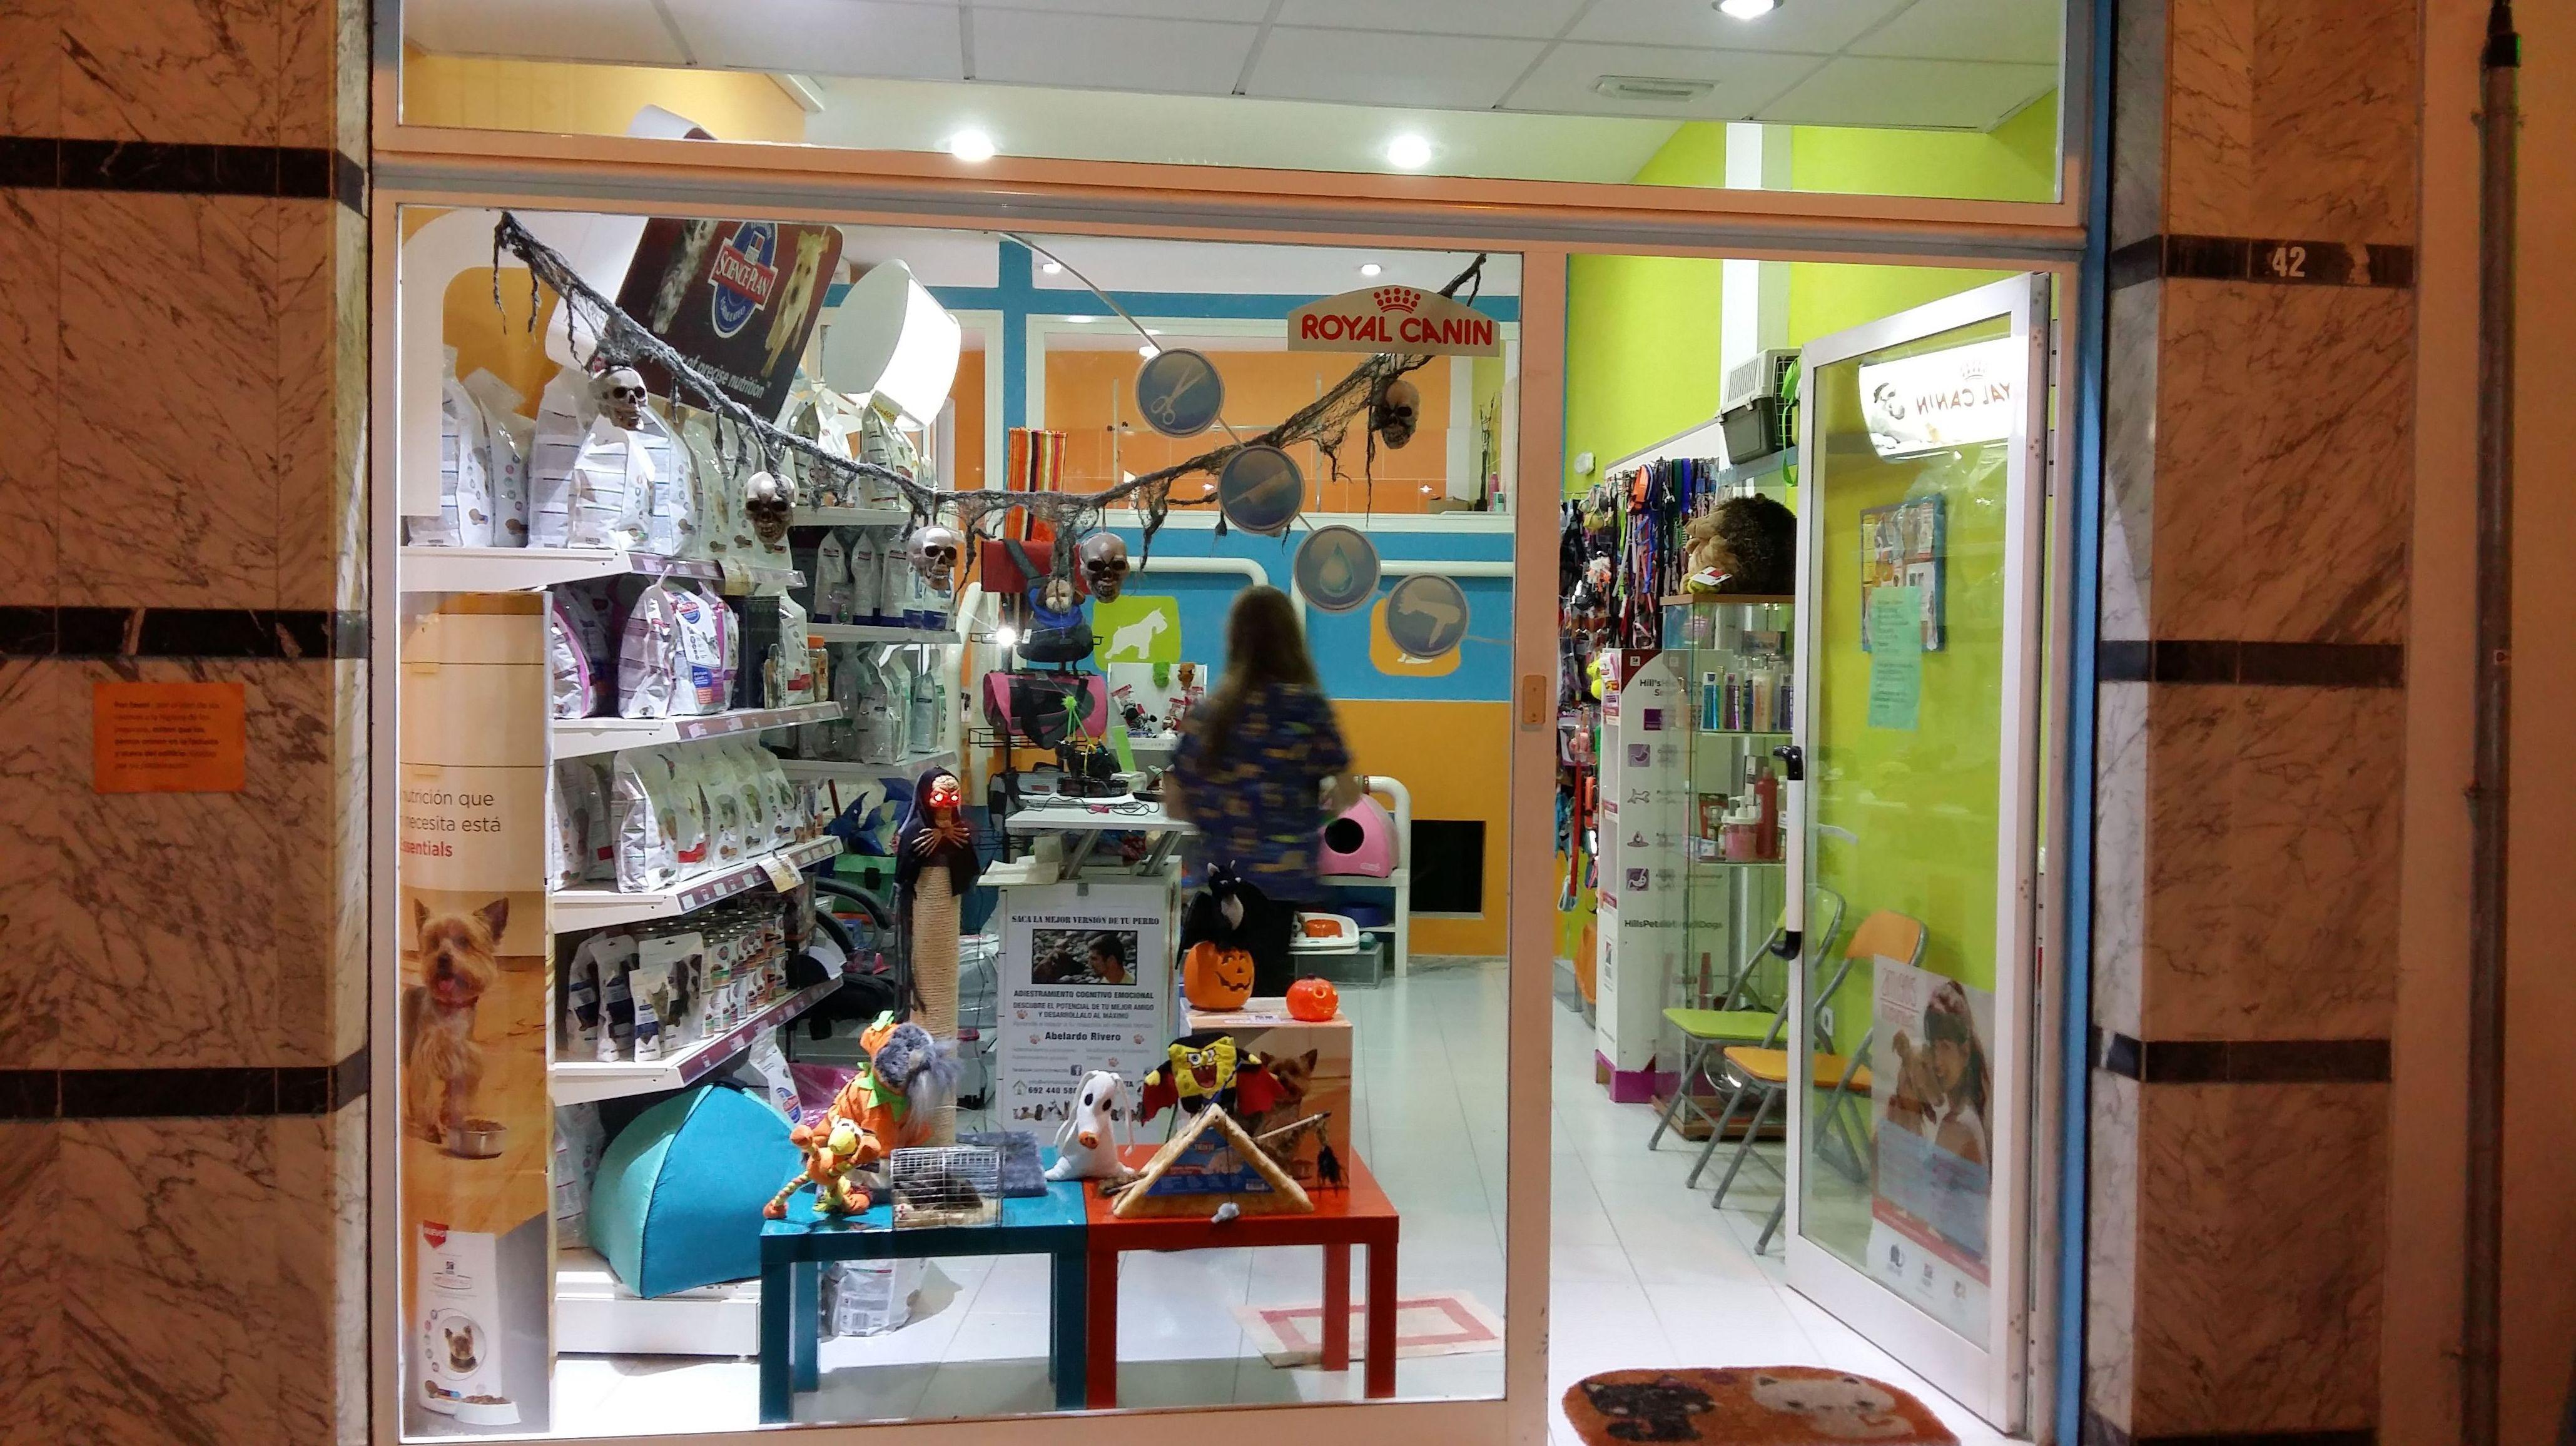 Tienda de mascotas en Tenerife